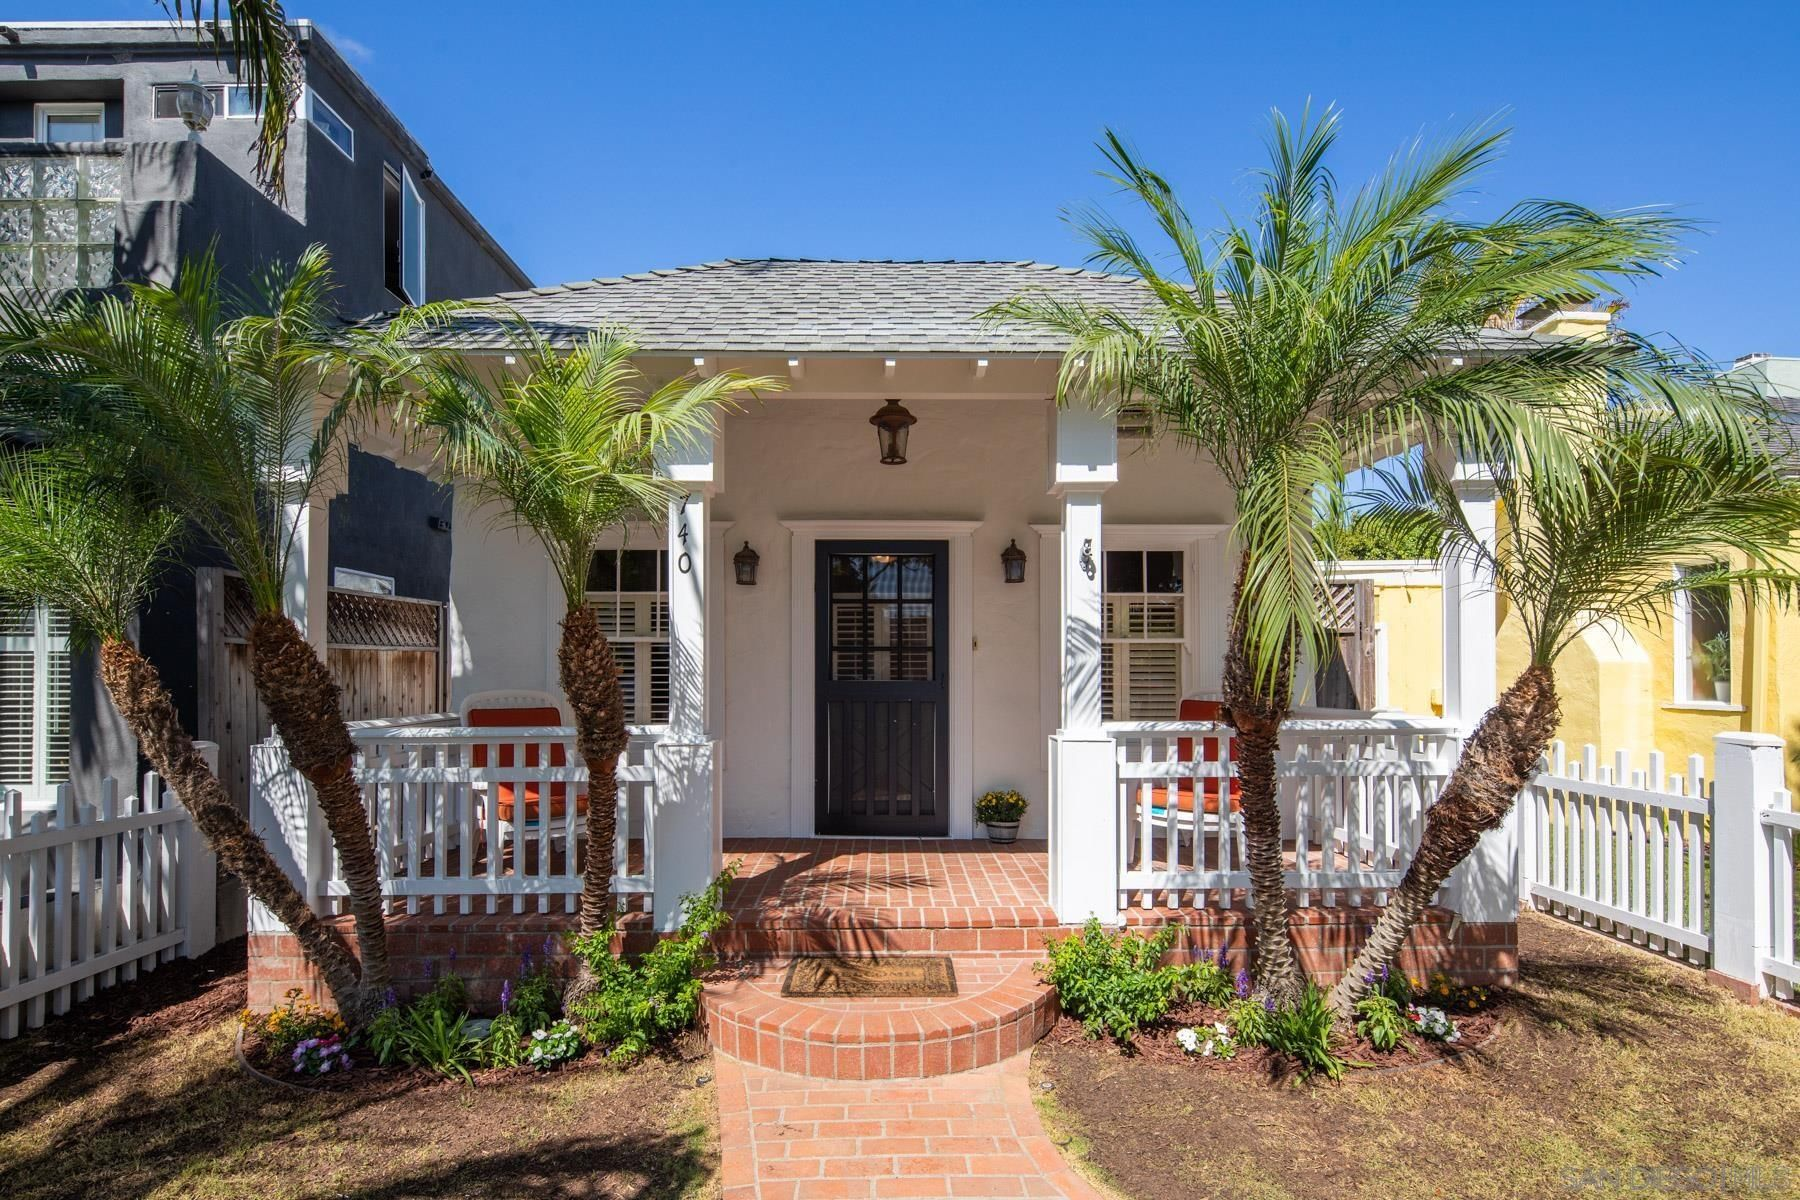 Main Photo: CORONADO VILLAGE House for sale : 3 bedrooms : 740 I Ave in Coronado